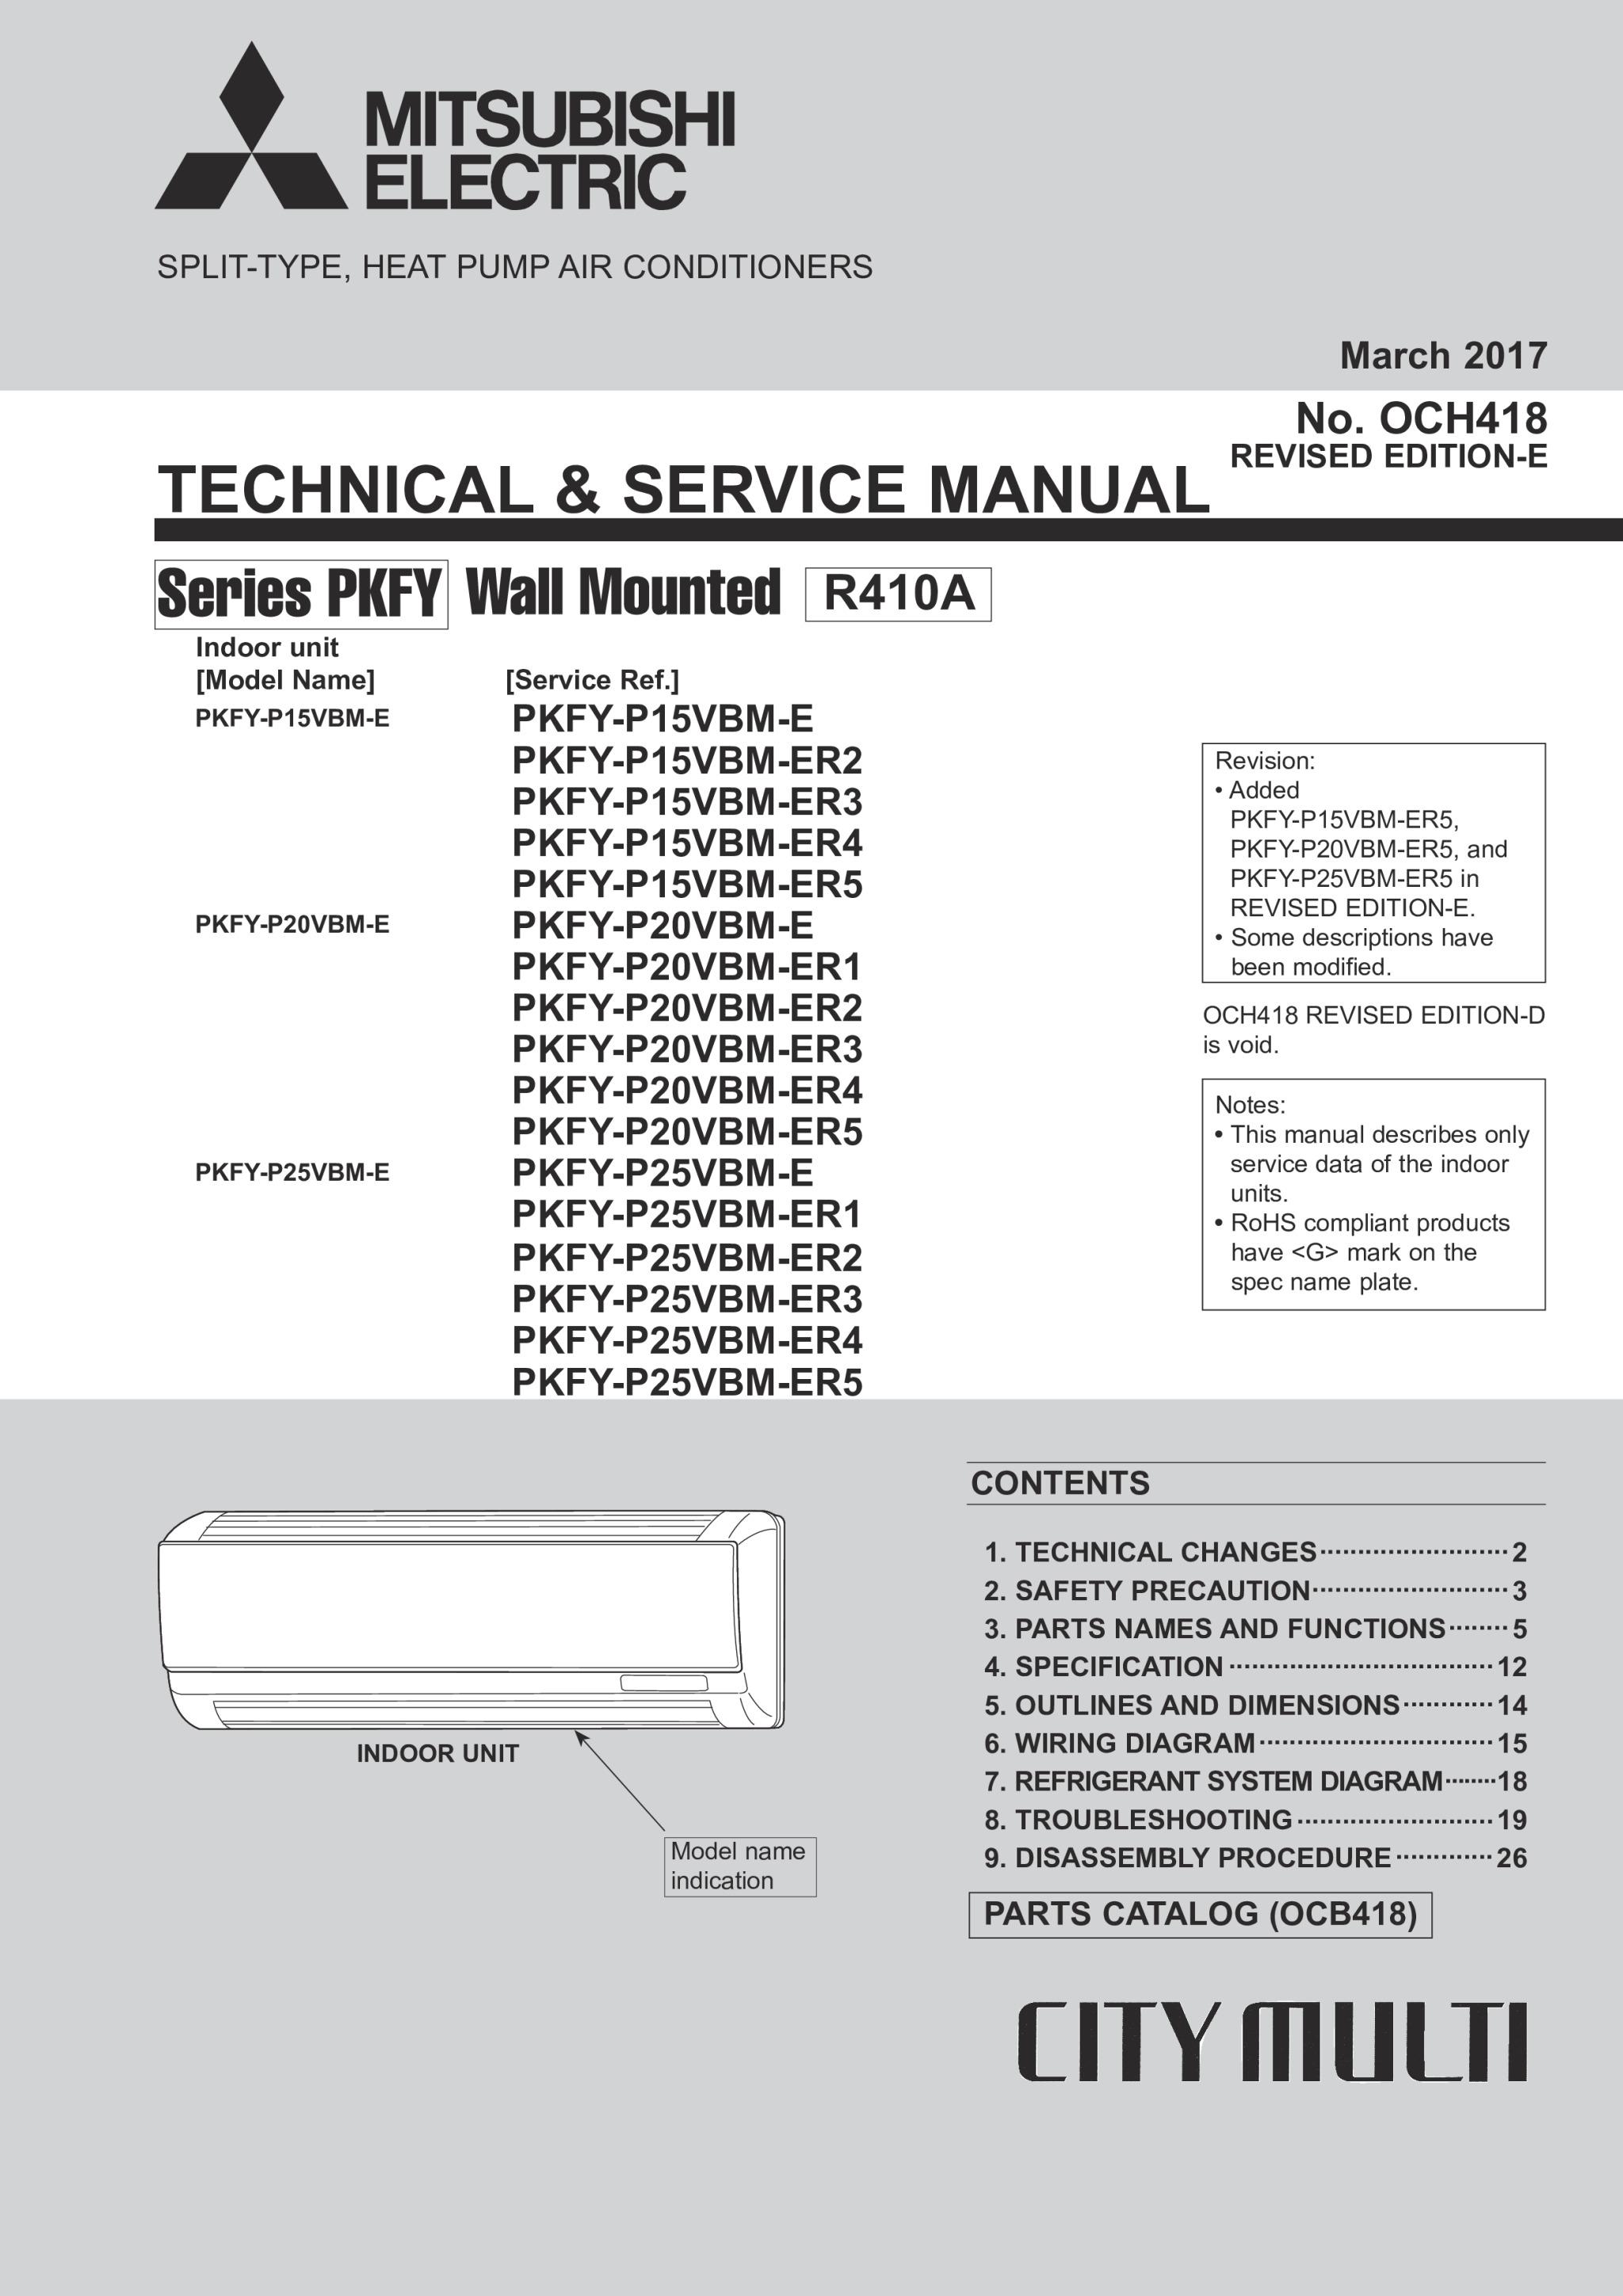 39a3b9 mitsubishi city multi service manual   wiring library  wiring library